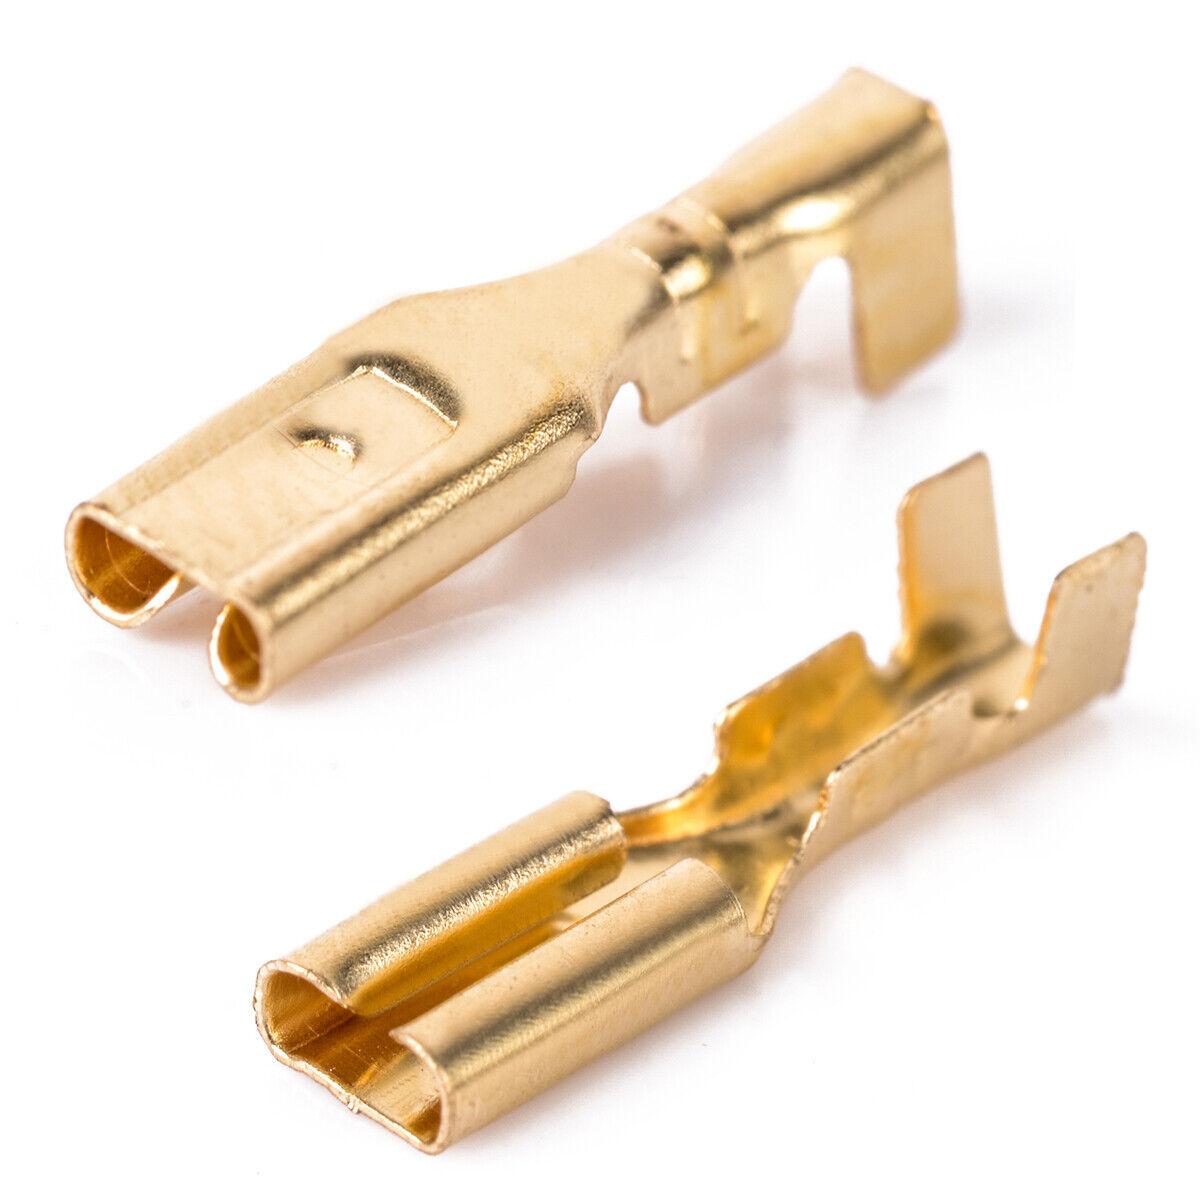 200*Kabelschuh Steckverbinder Flachsteckhülsen Flachstecker Spade Sleeve 6.3mm+